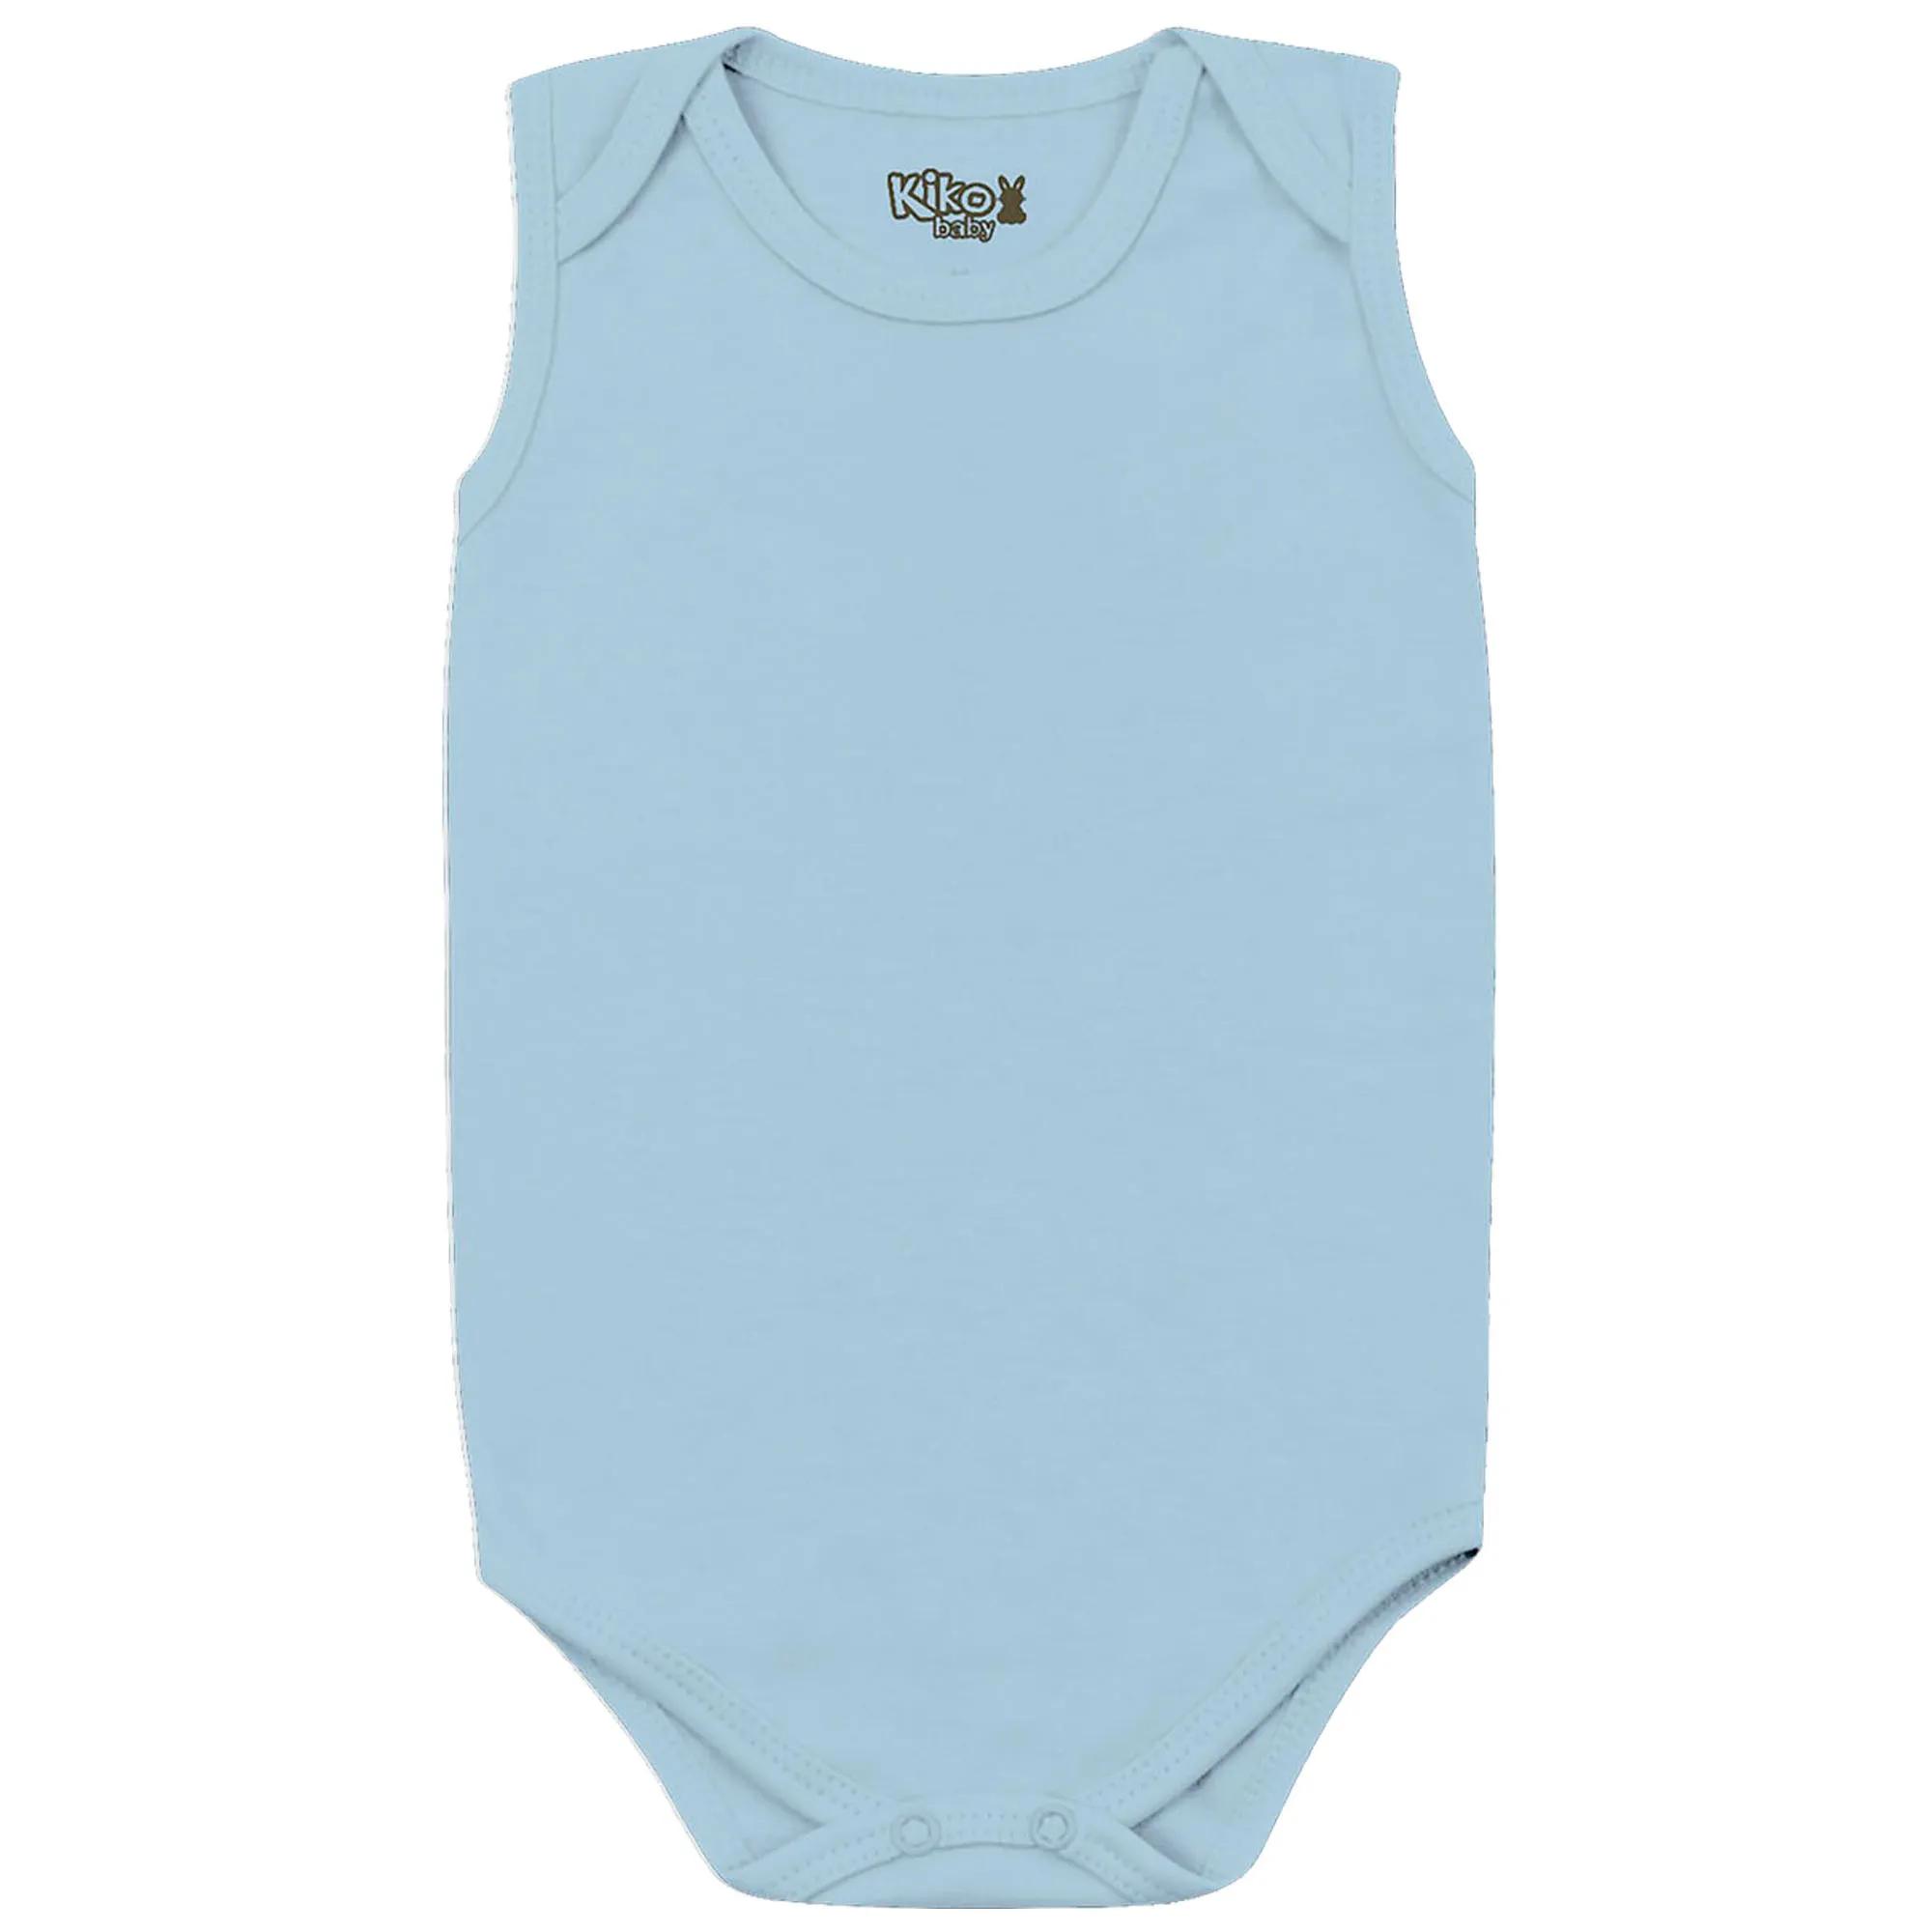 Body Kiko Baby Regata - RN ao G